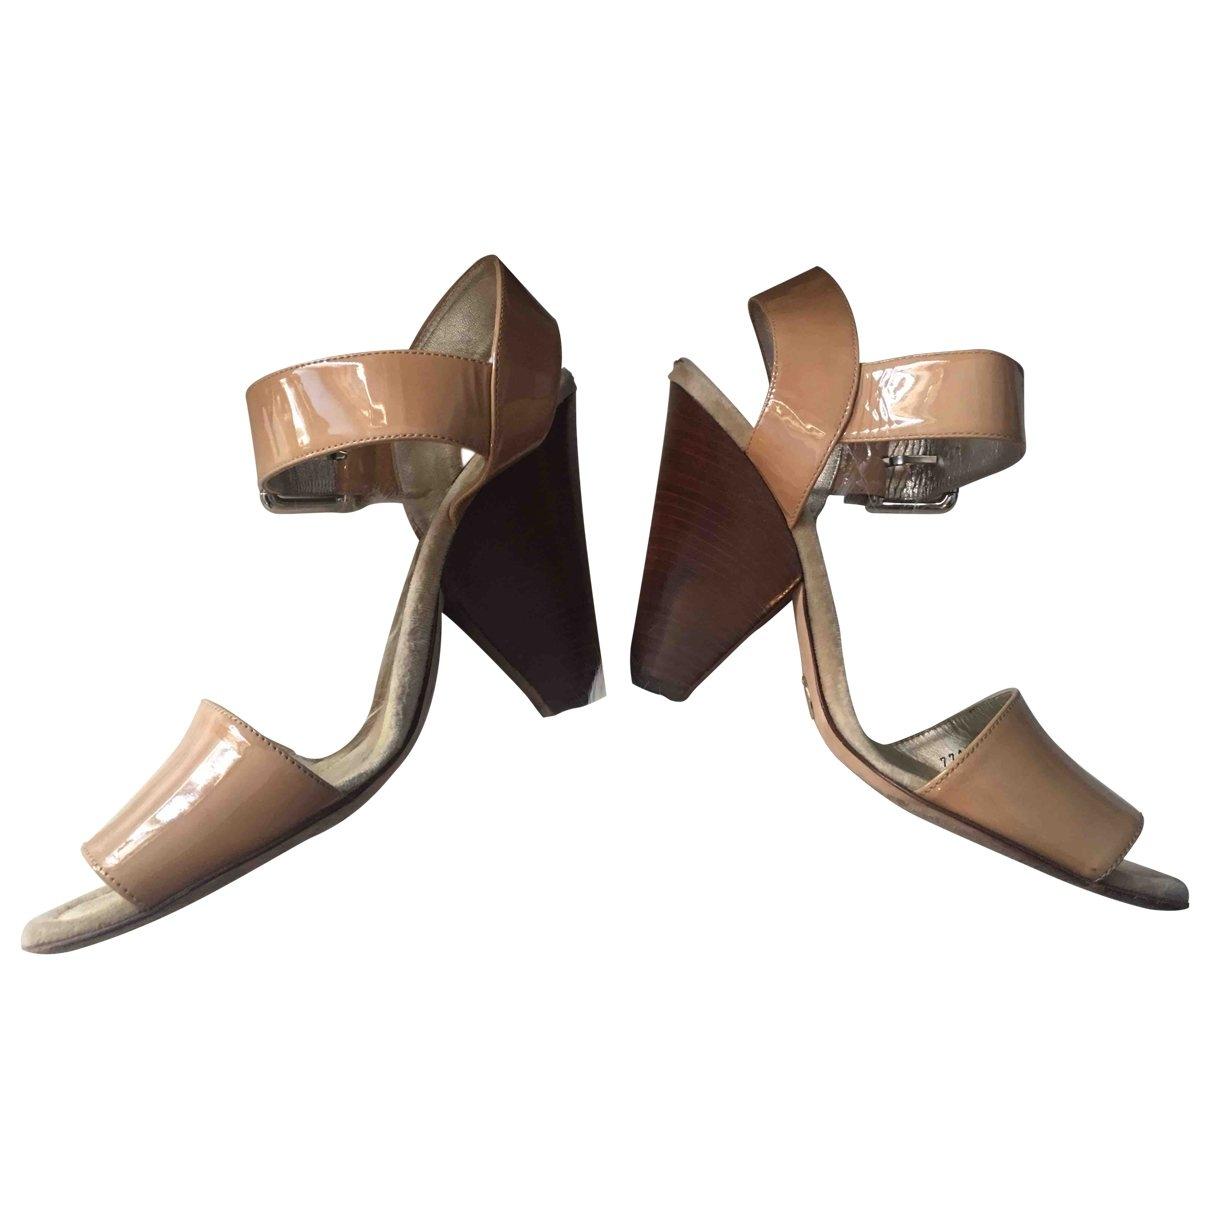 Dolce & Gabbana \N Beige Patent leather Sandals for Women 39 EU